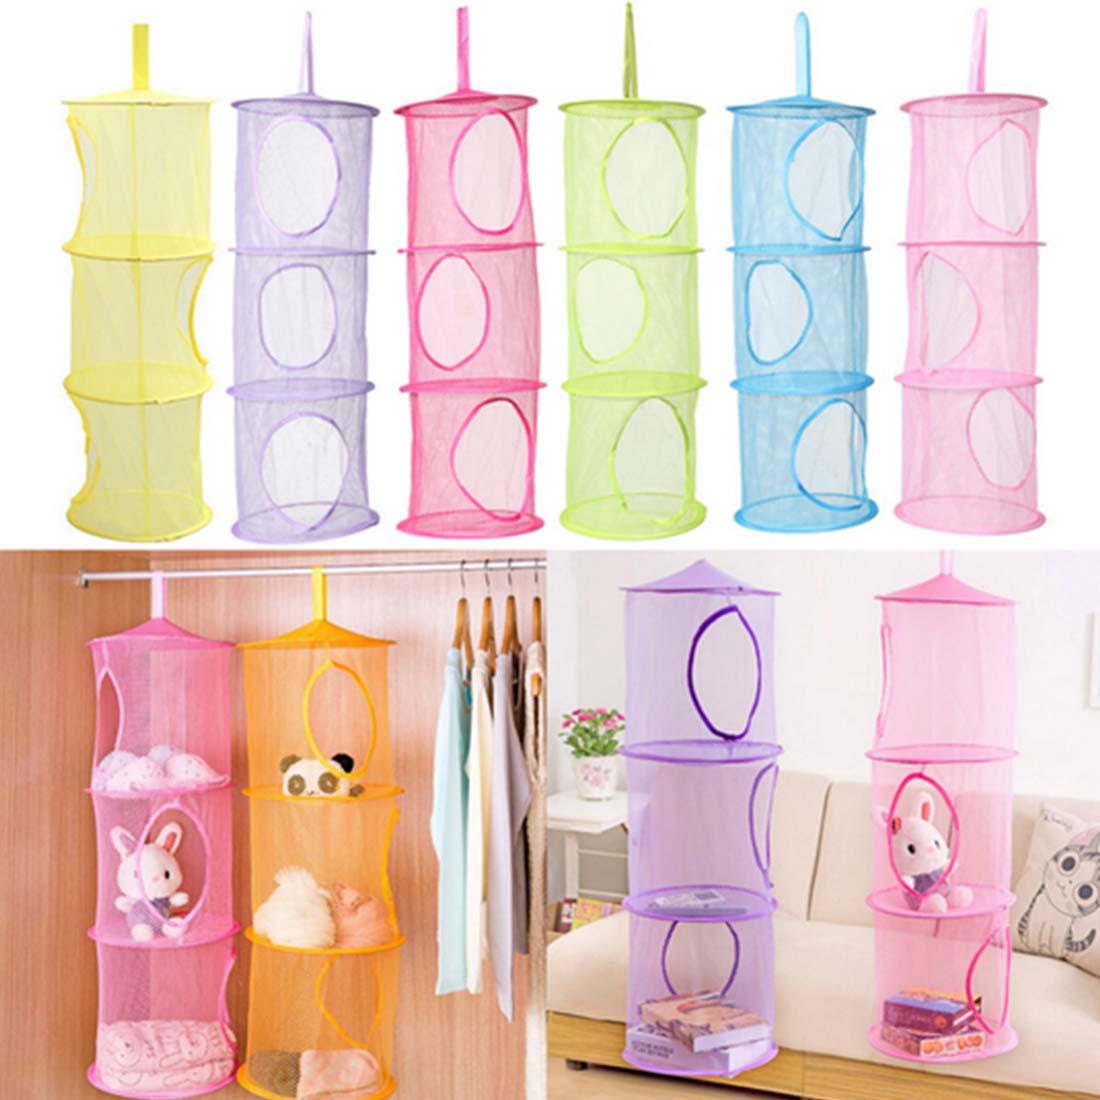 Gentil 3 Tier Mesh Hanging Foldable Nest Storage Baskets Wardrobe Laundry Basket  Portable Underwear Sundries Organizer Toys Container